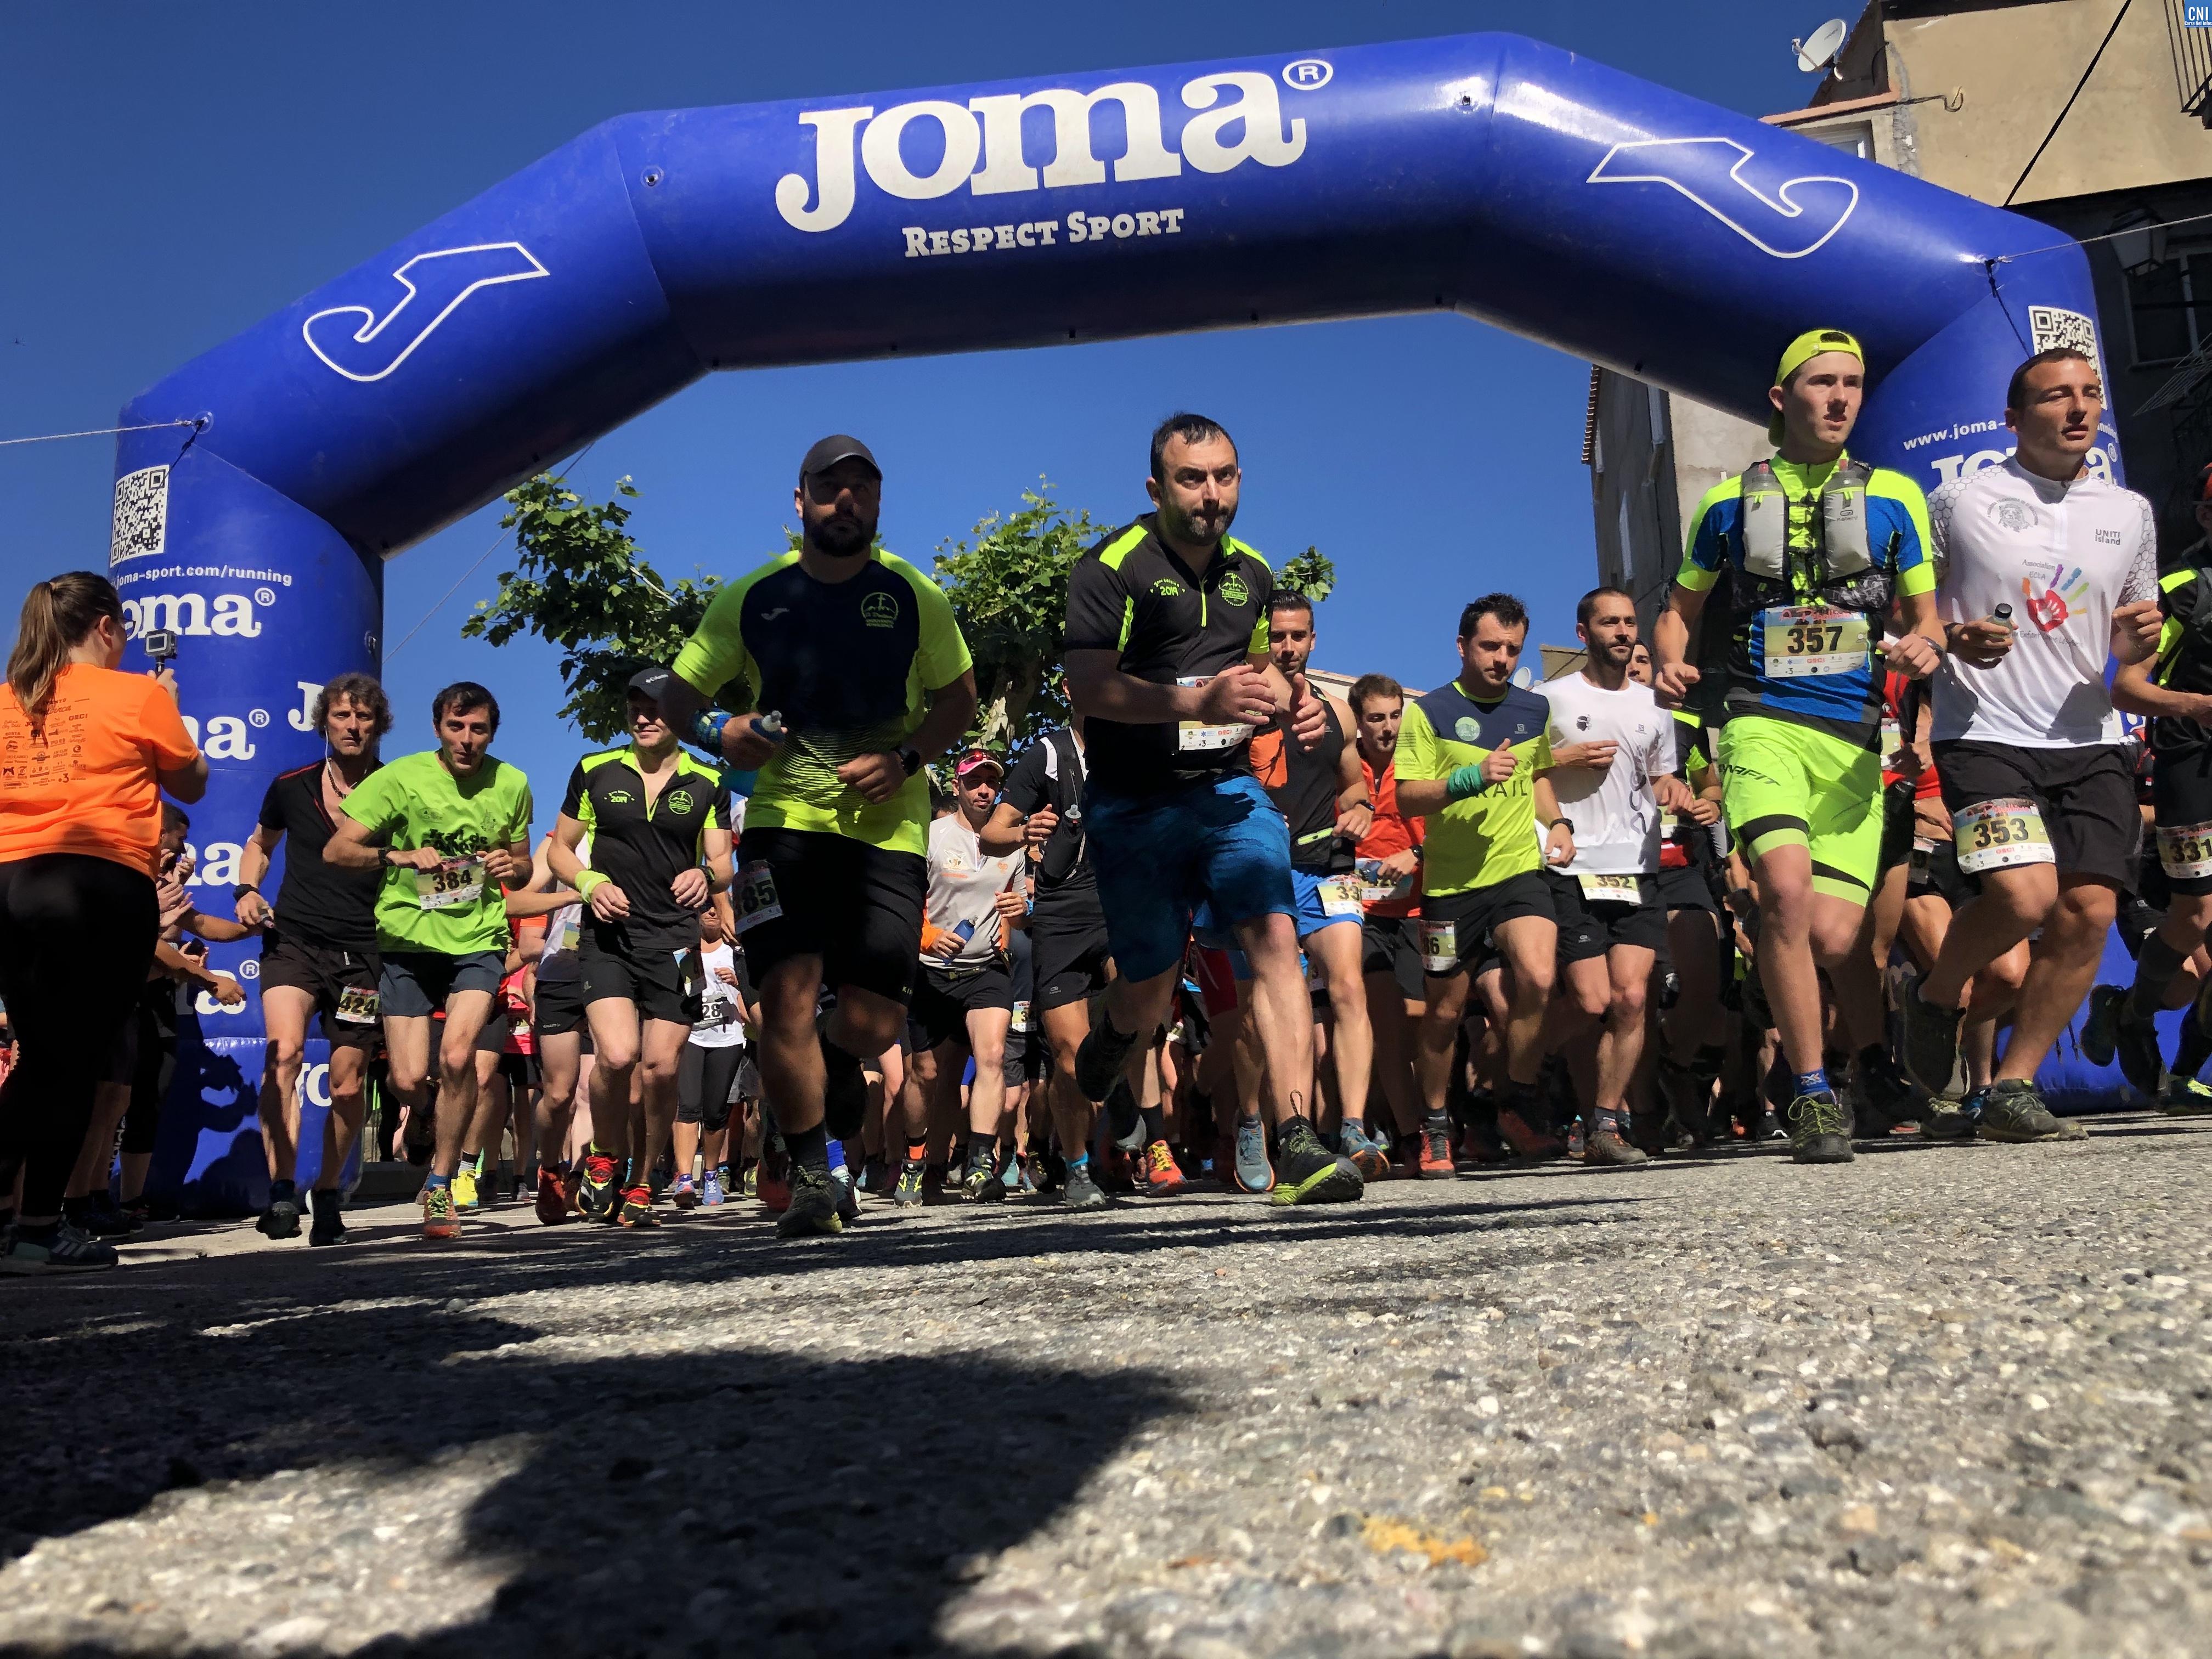 A Petralbinca : Noël Giordano pulvérise le record du trail des 21 km